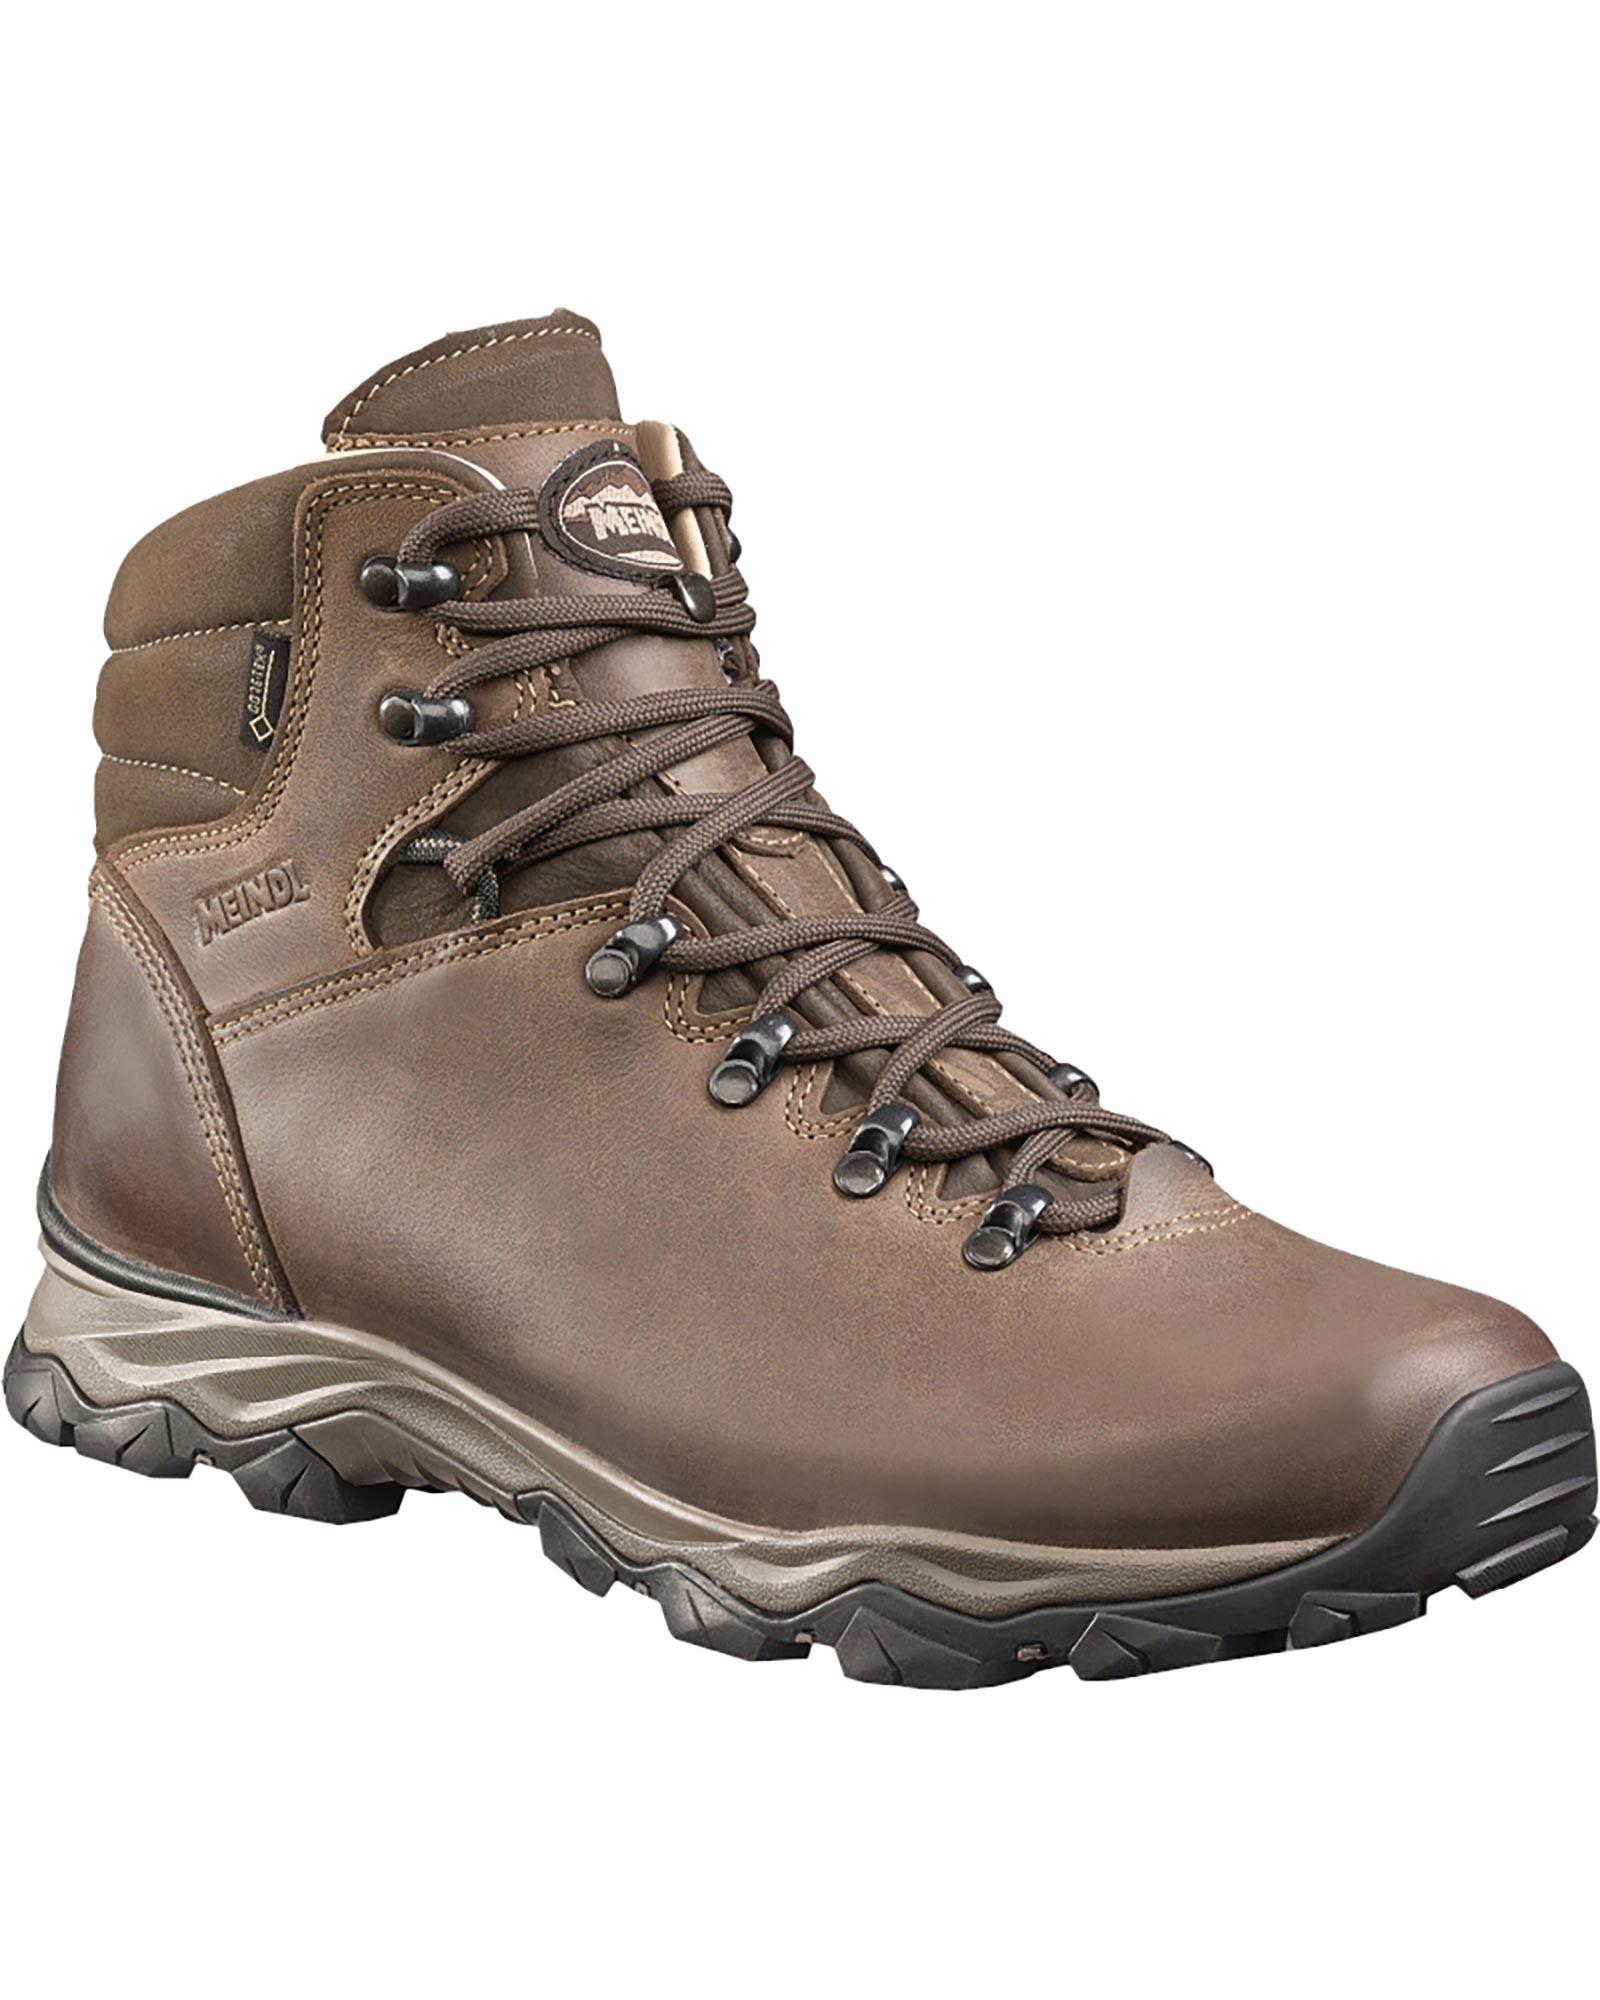 Meindl Men's Peru GORE-TEX Walking Boots 0